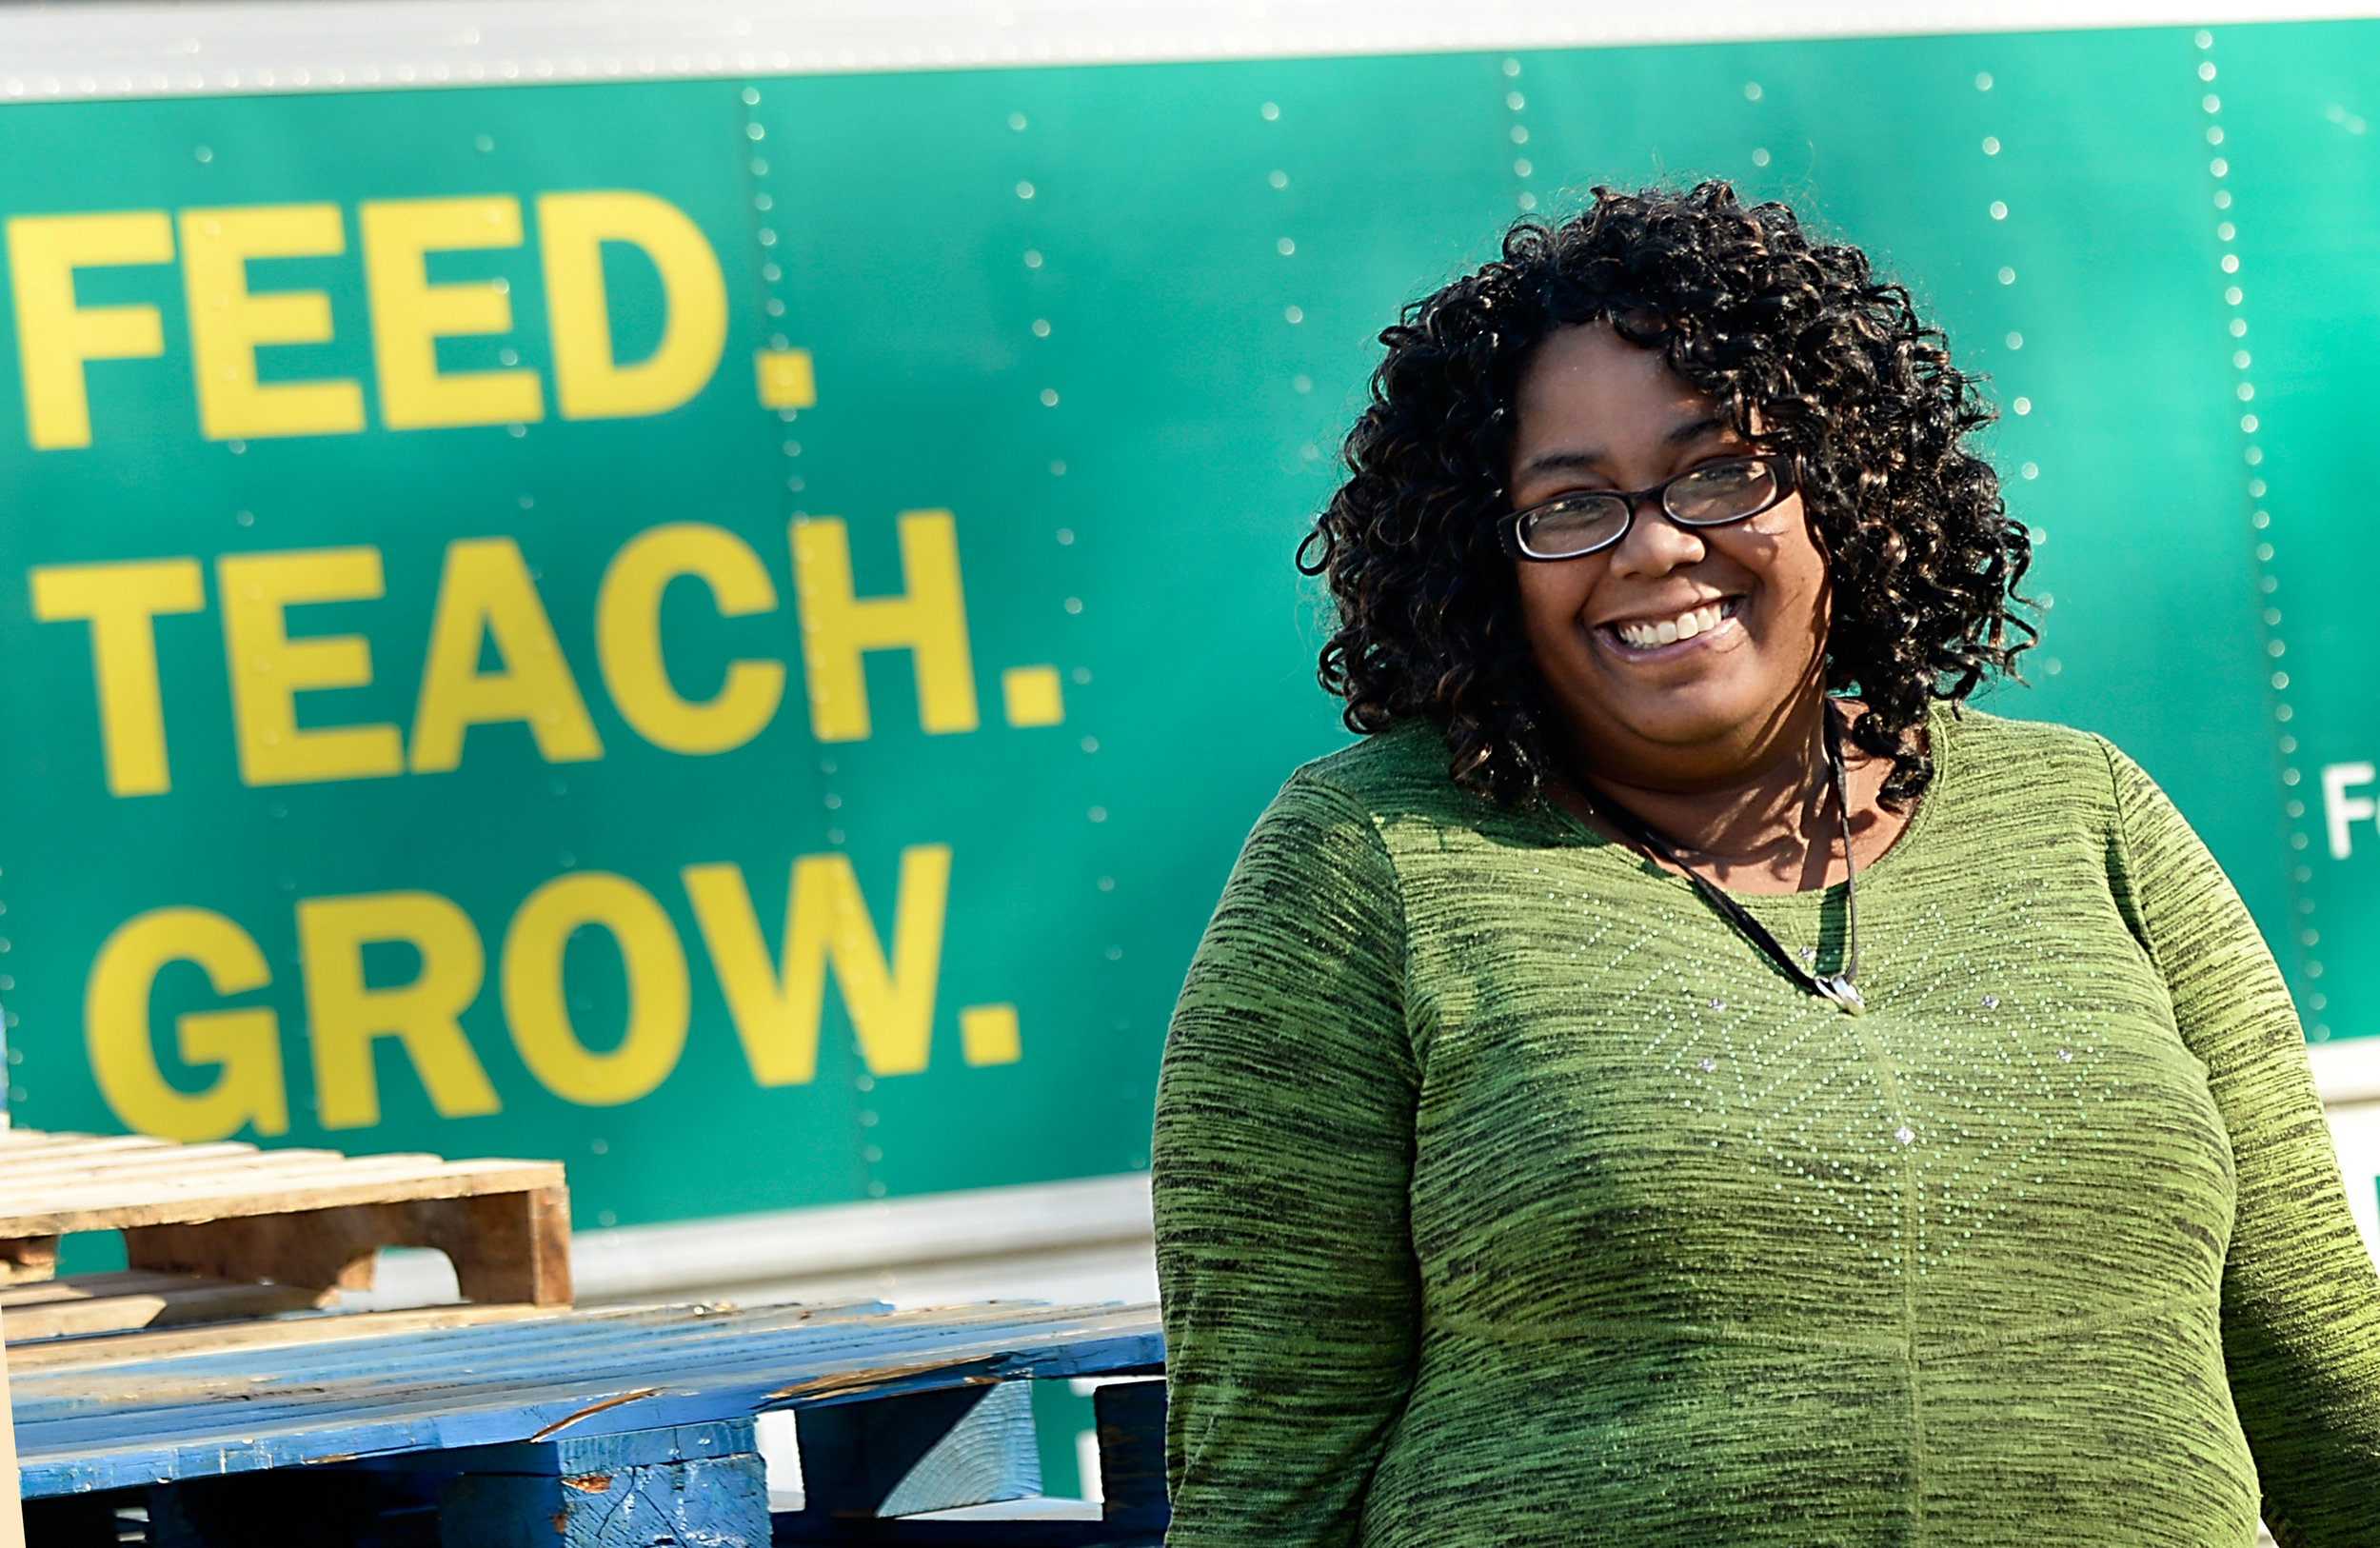 Inter-Faith Food Shuttle's Fostering Wellness graduate Kim Greehy December 14, 2017 in Raleigh, N.C. (Photo by Sara D. Davis)